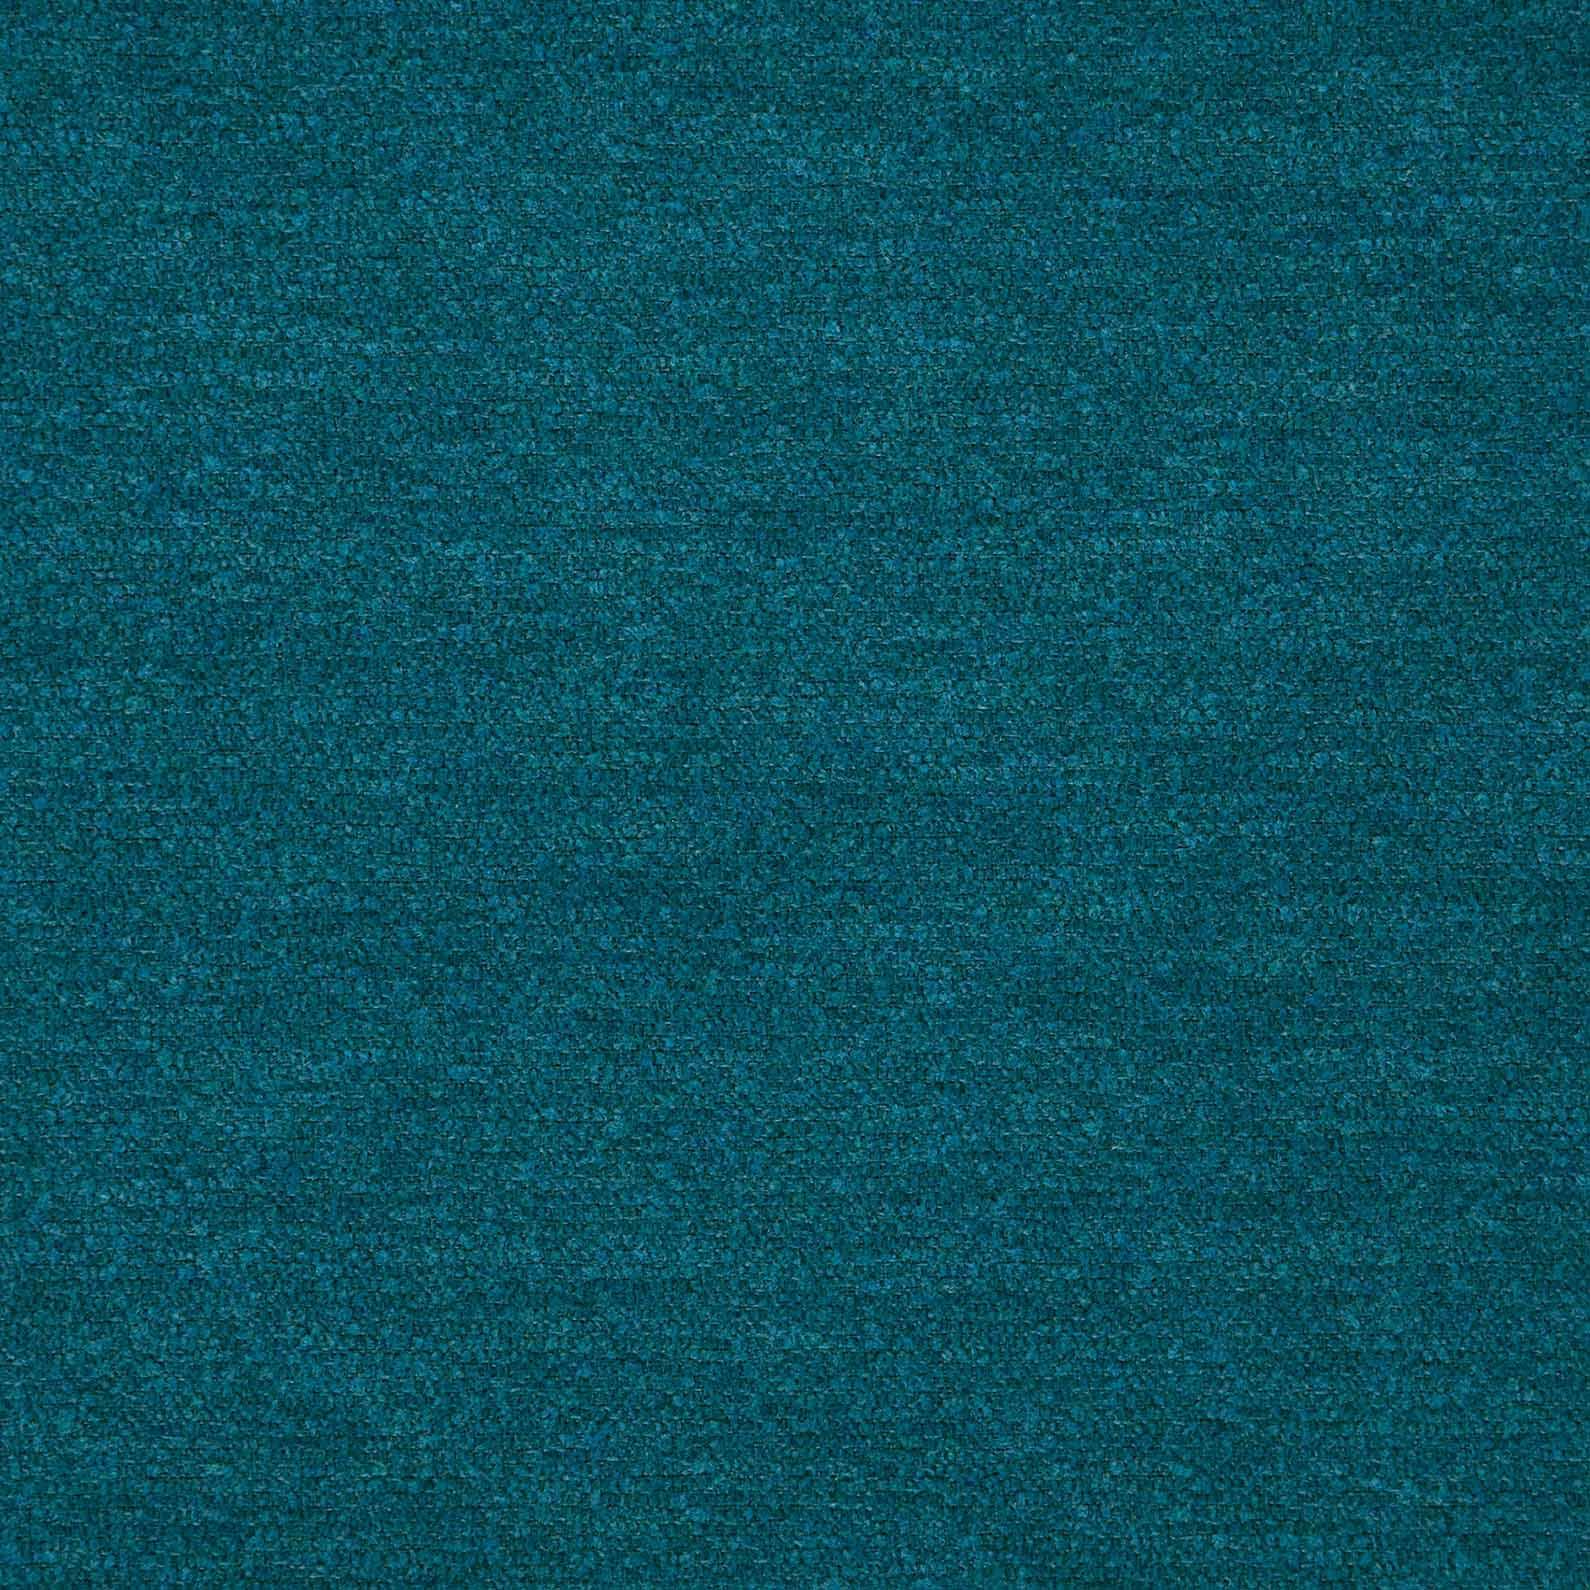 Loft Turquoise